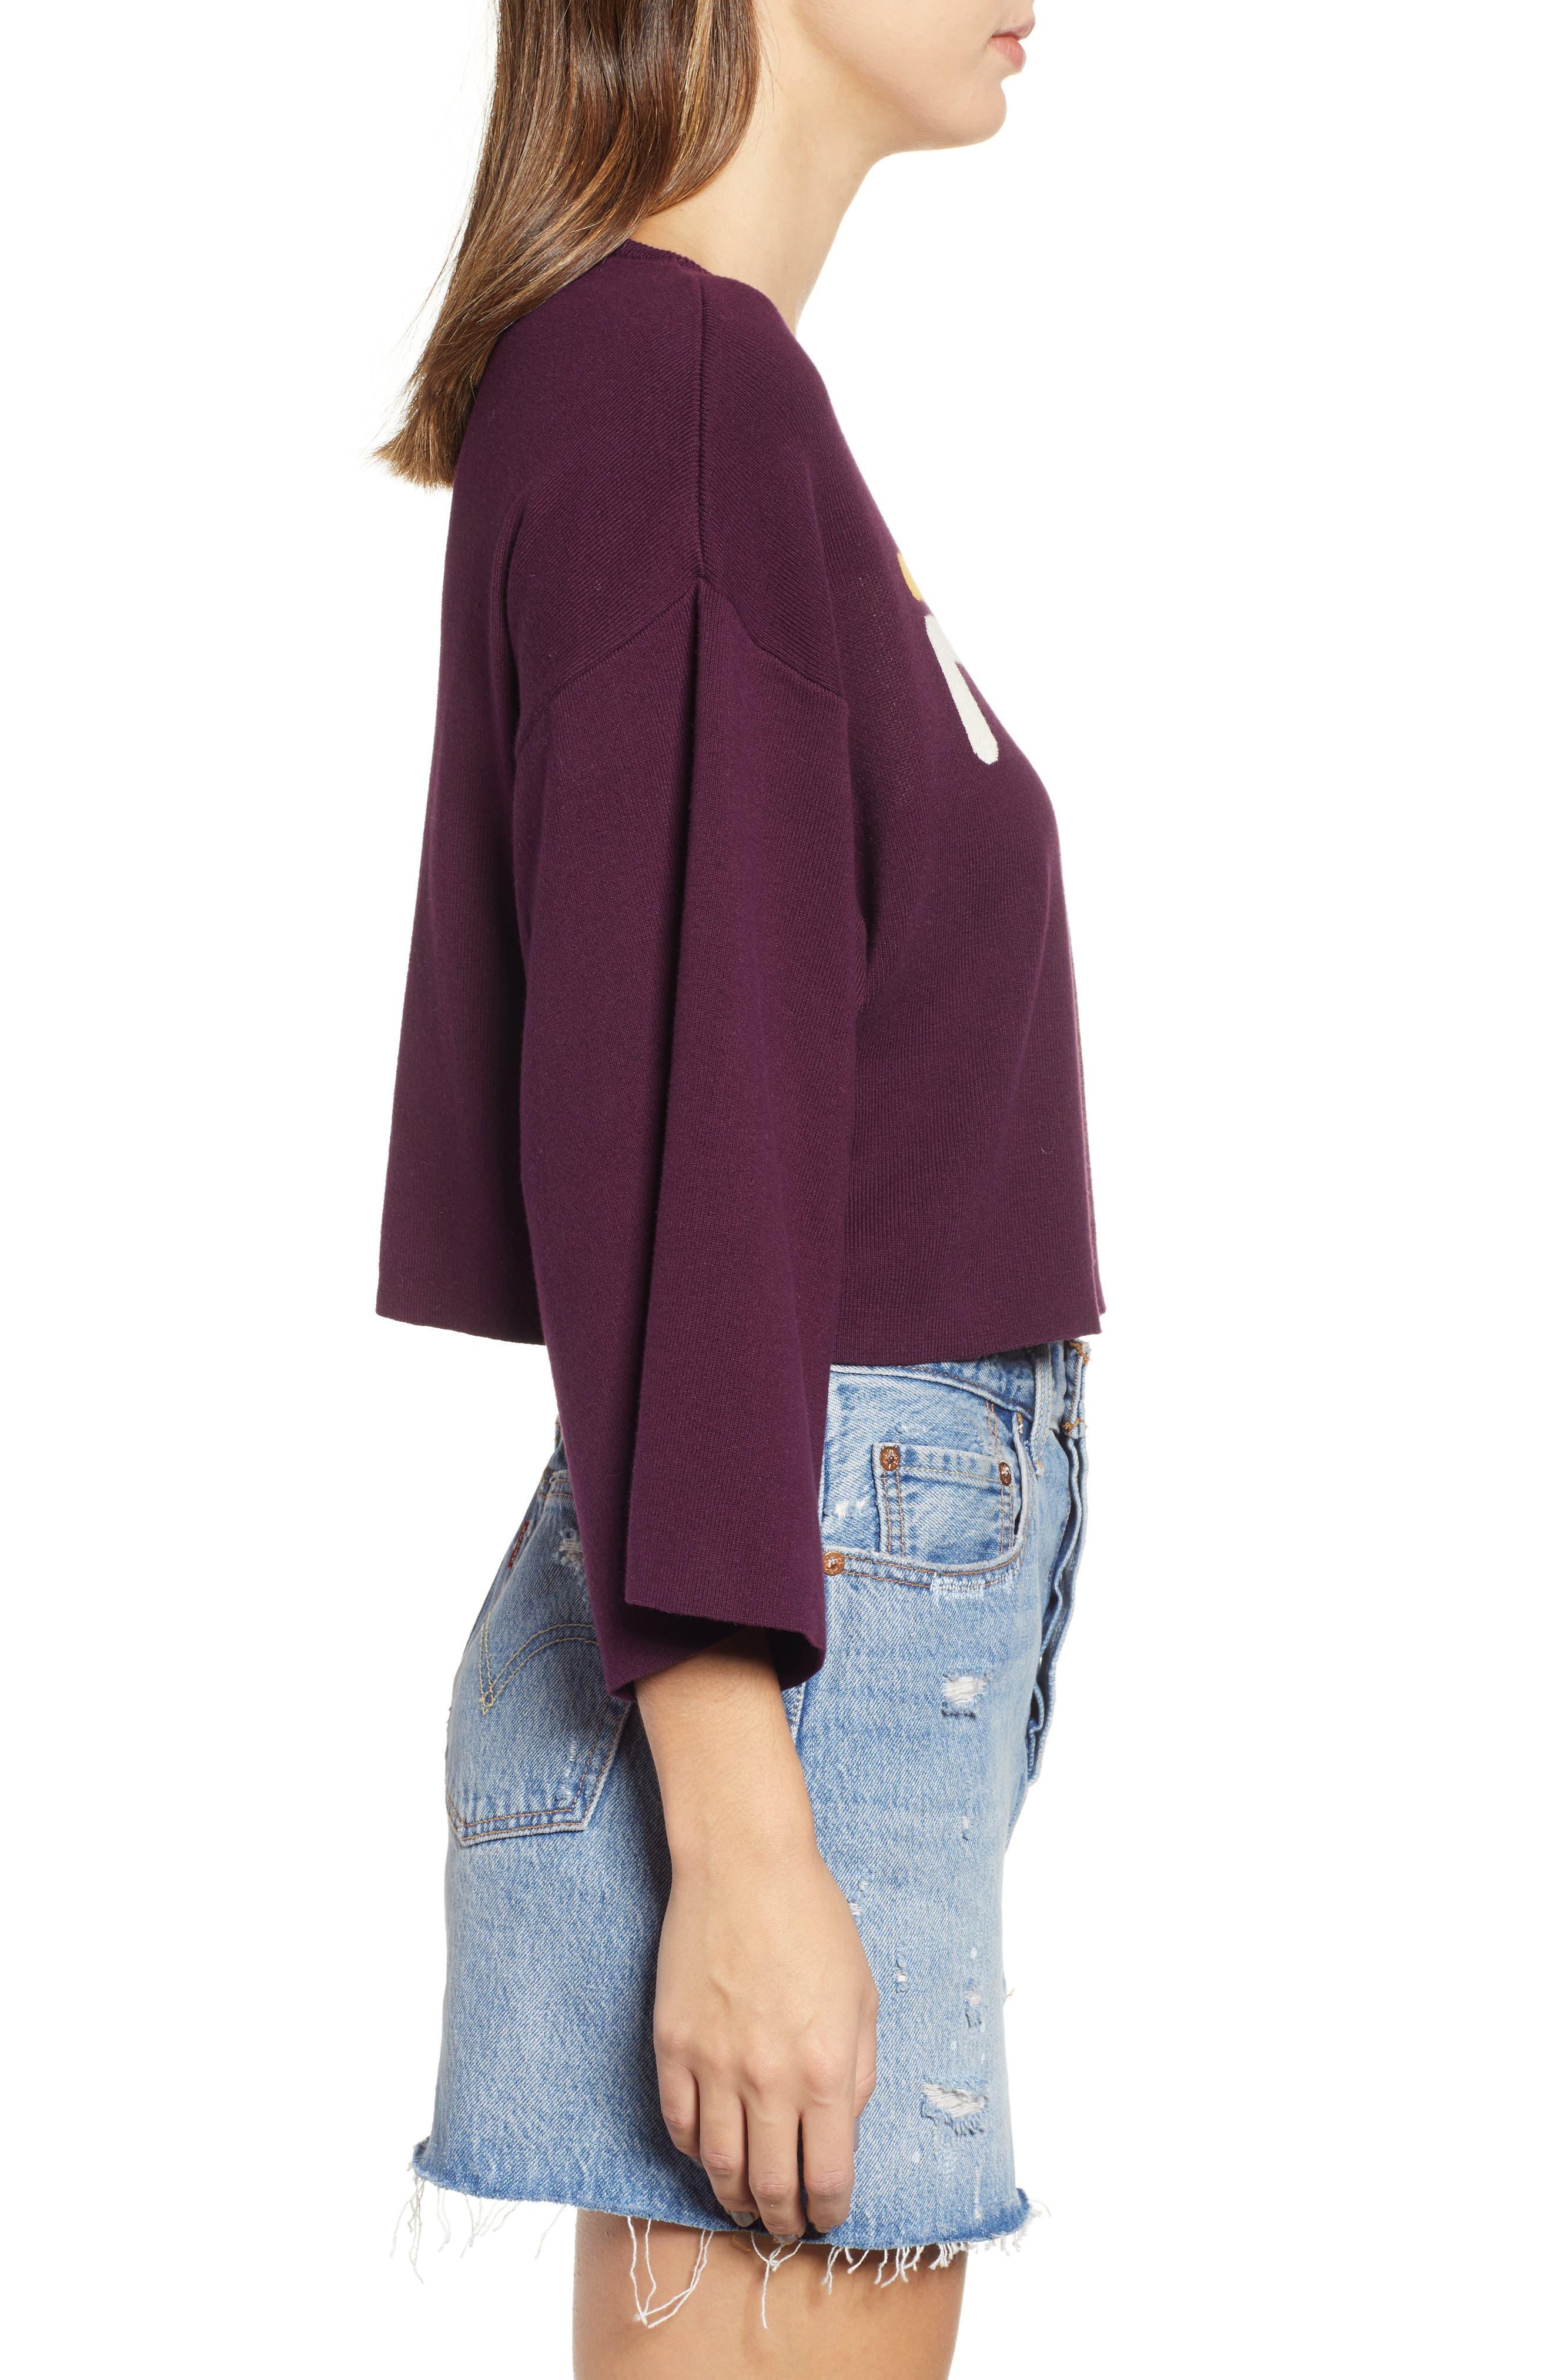 FILA, Palmira Crop Sweater, Alternate thumbnail 4, color, POTENT PURPLE